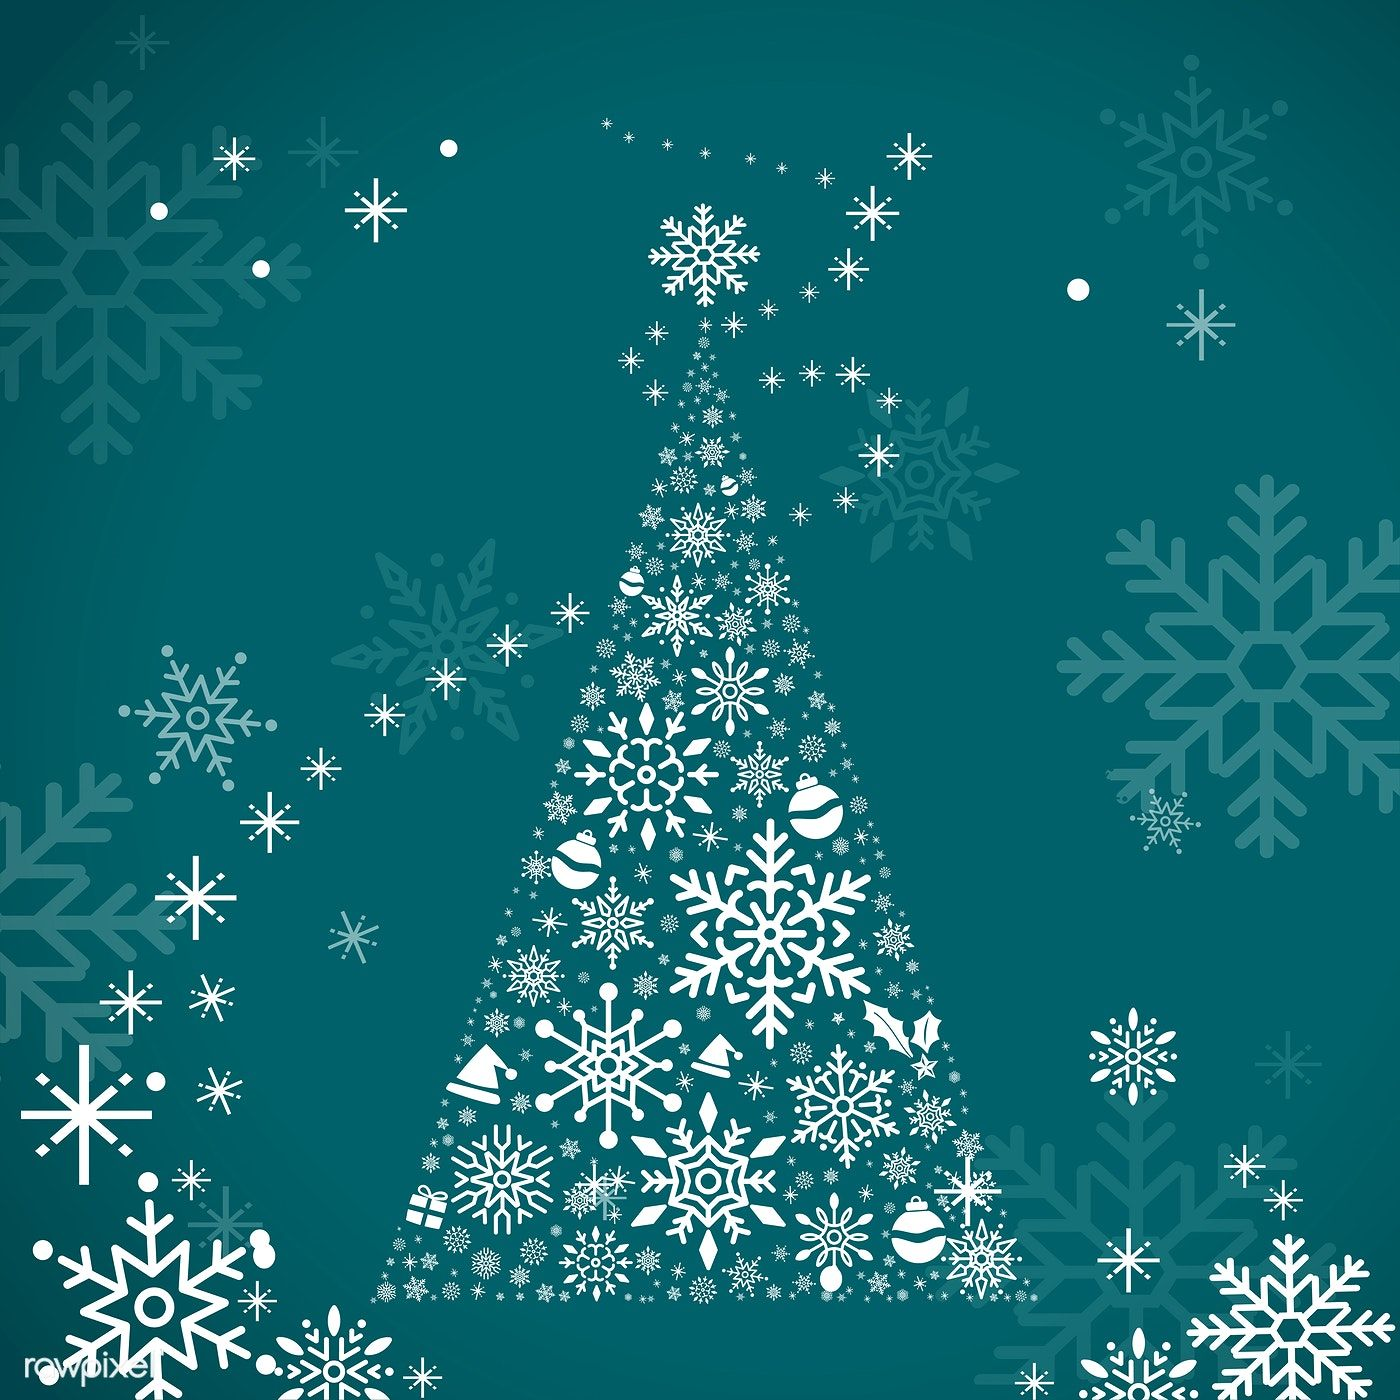 Green Christmas Winter Holiday Background With Snowflake And Christmas Tree Vector Free Image By Holiday Background Christmas Tree Background Blue Christmas